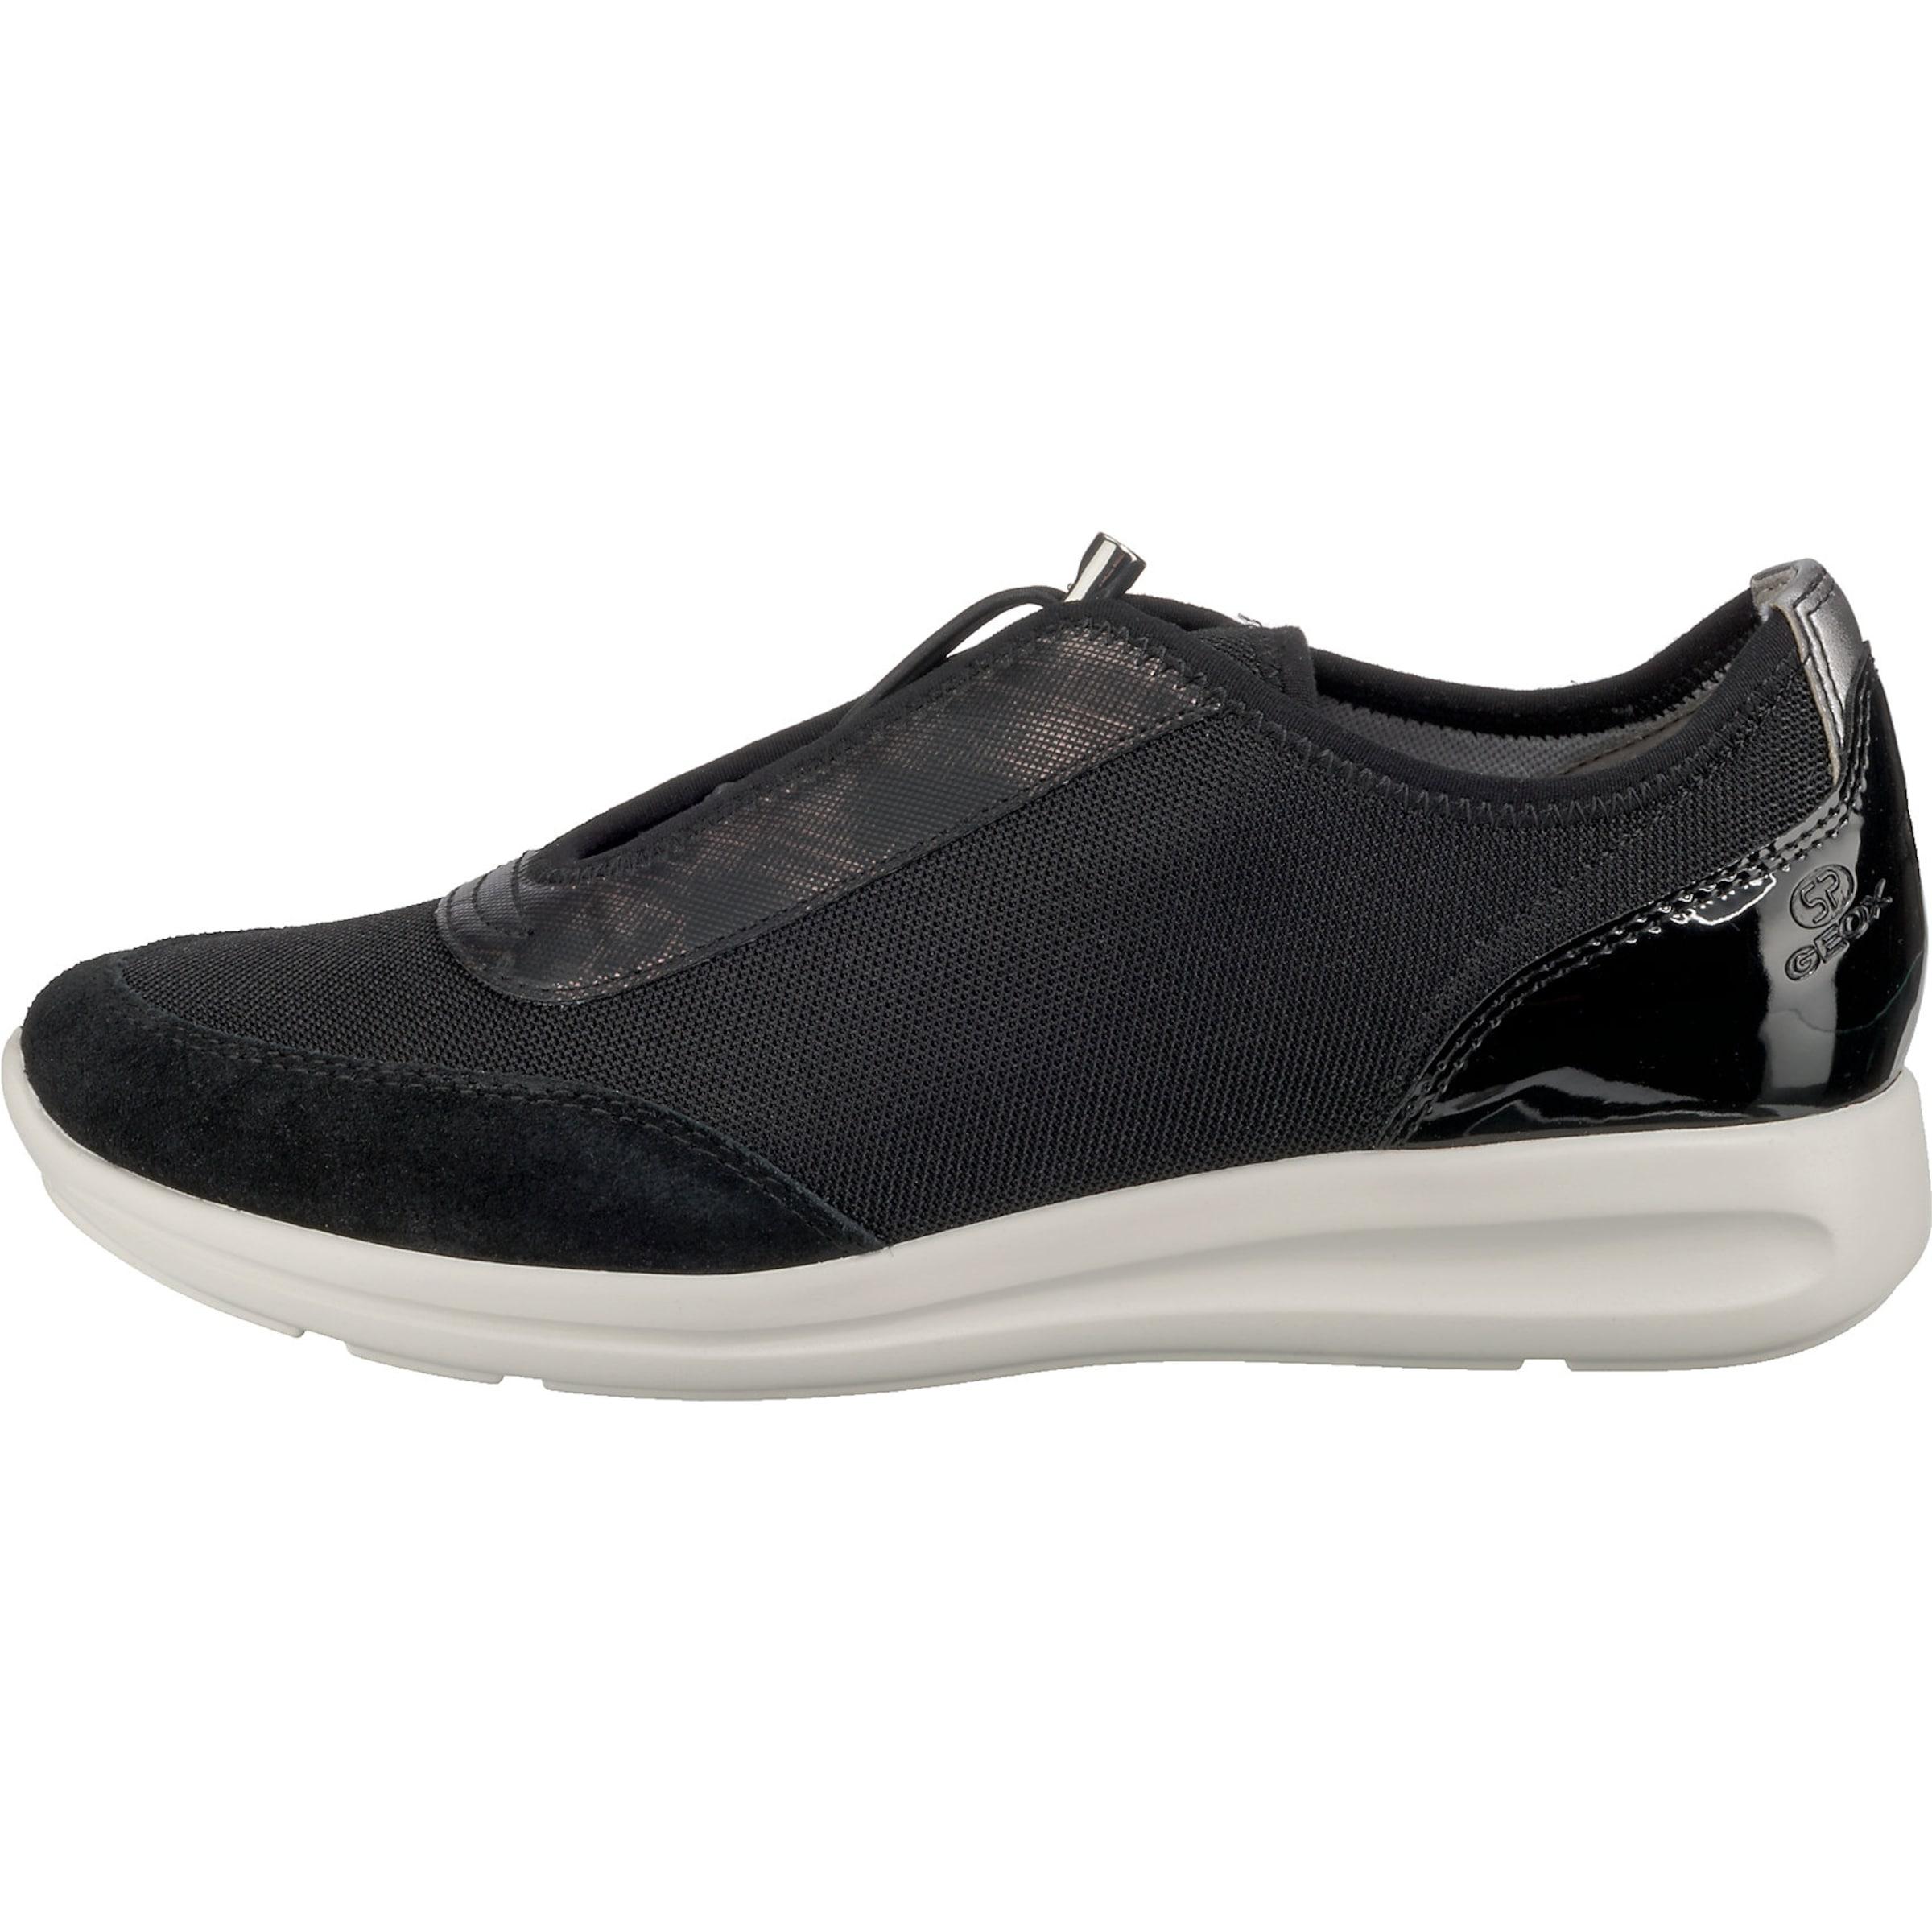 In Sneakers Geox In Geox Schwarz Sneakers QoWrdxeCEB